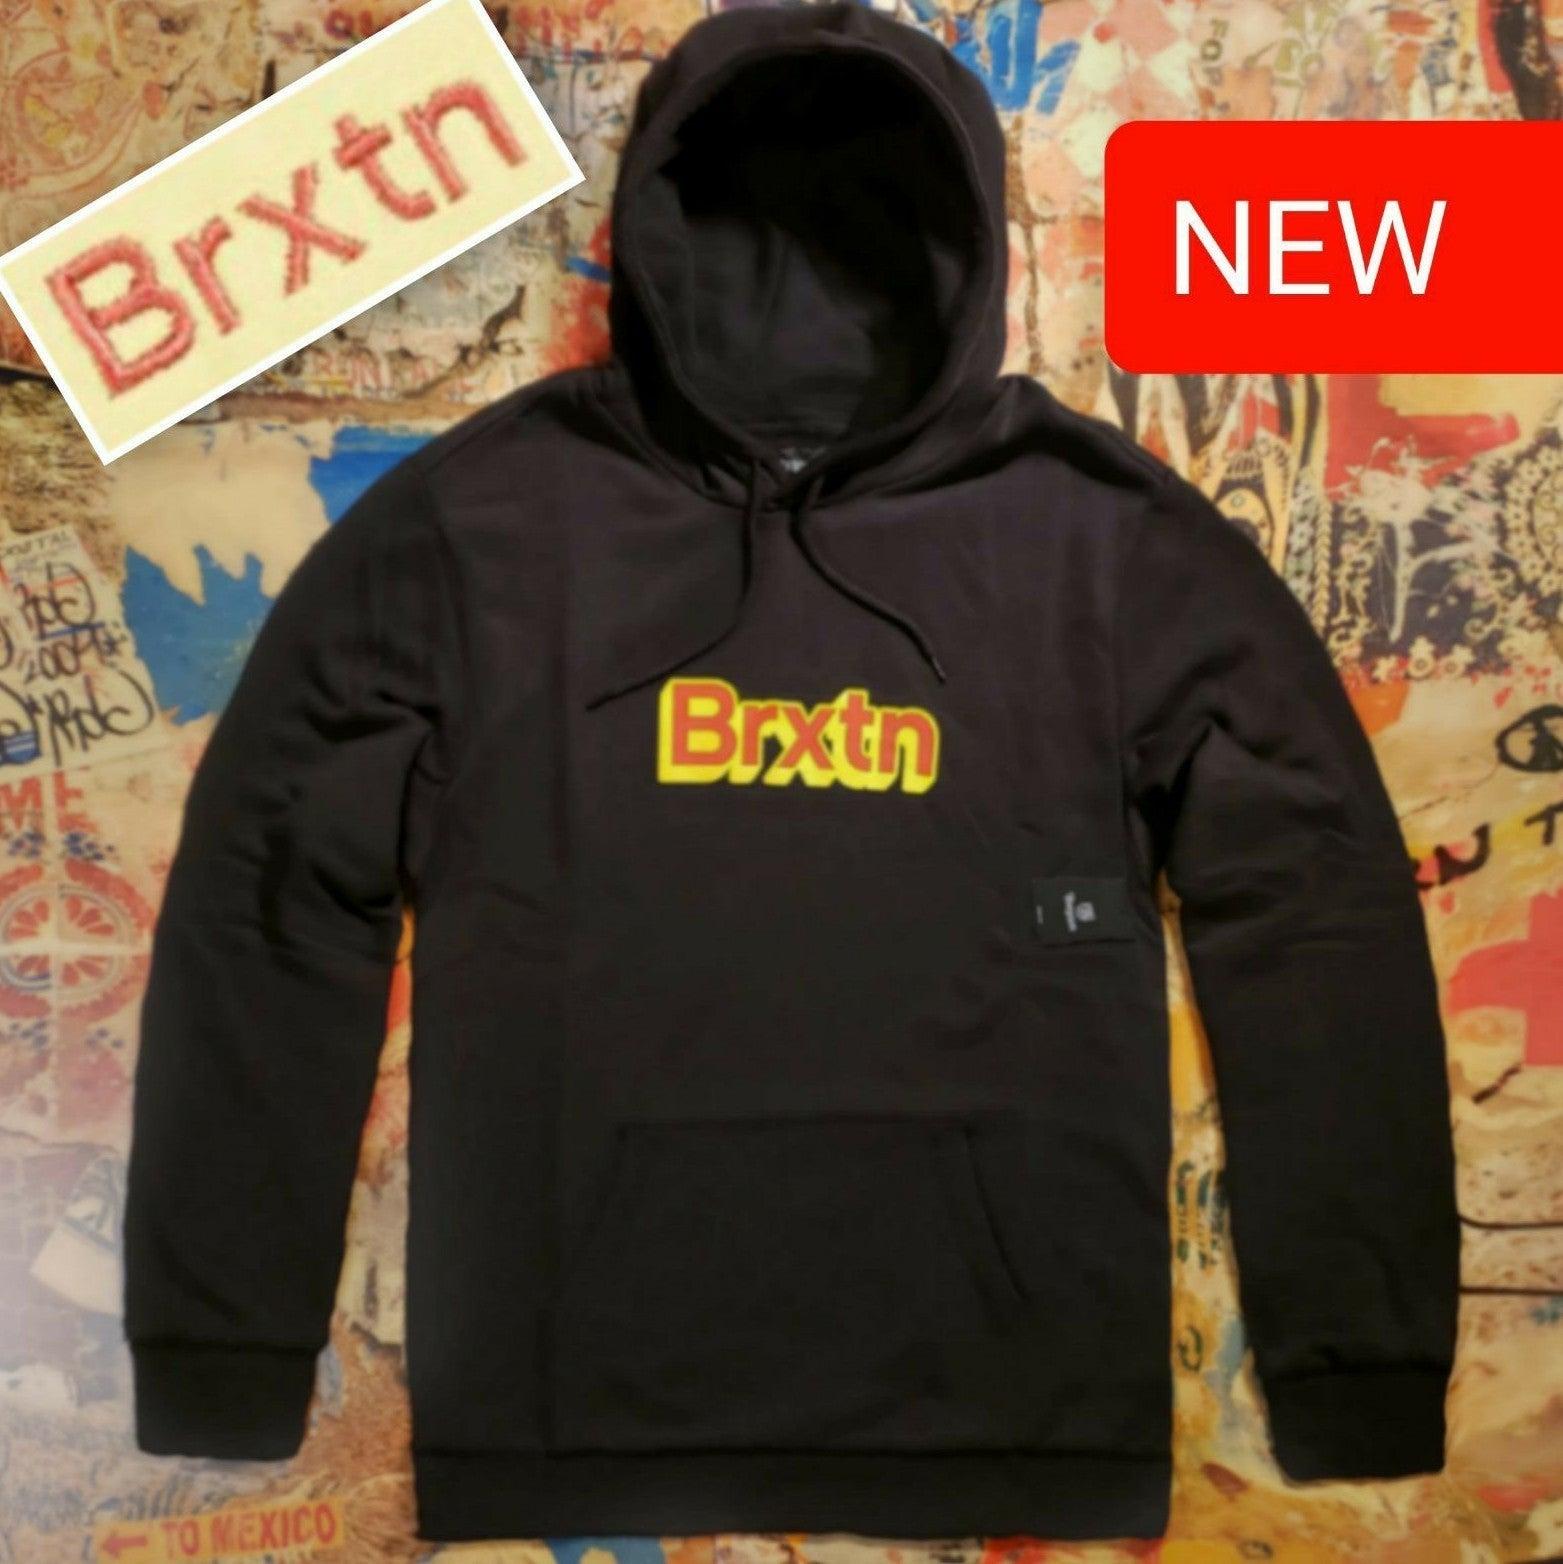 $90 New Brixton Fleece Hoodie! XL